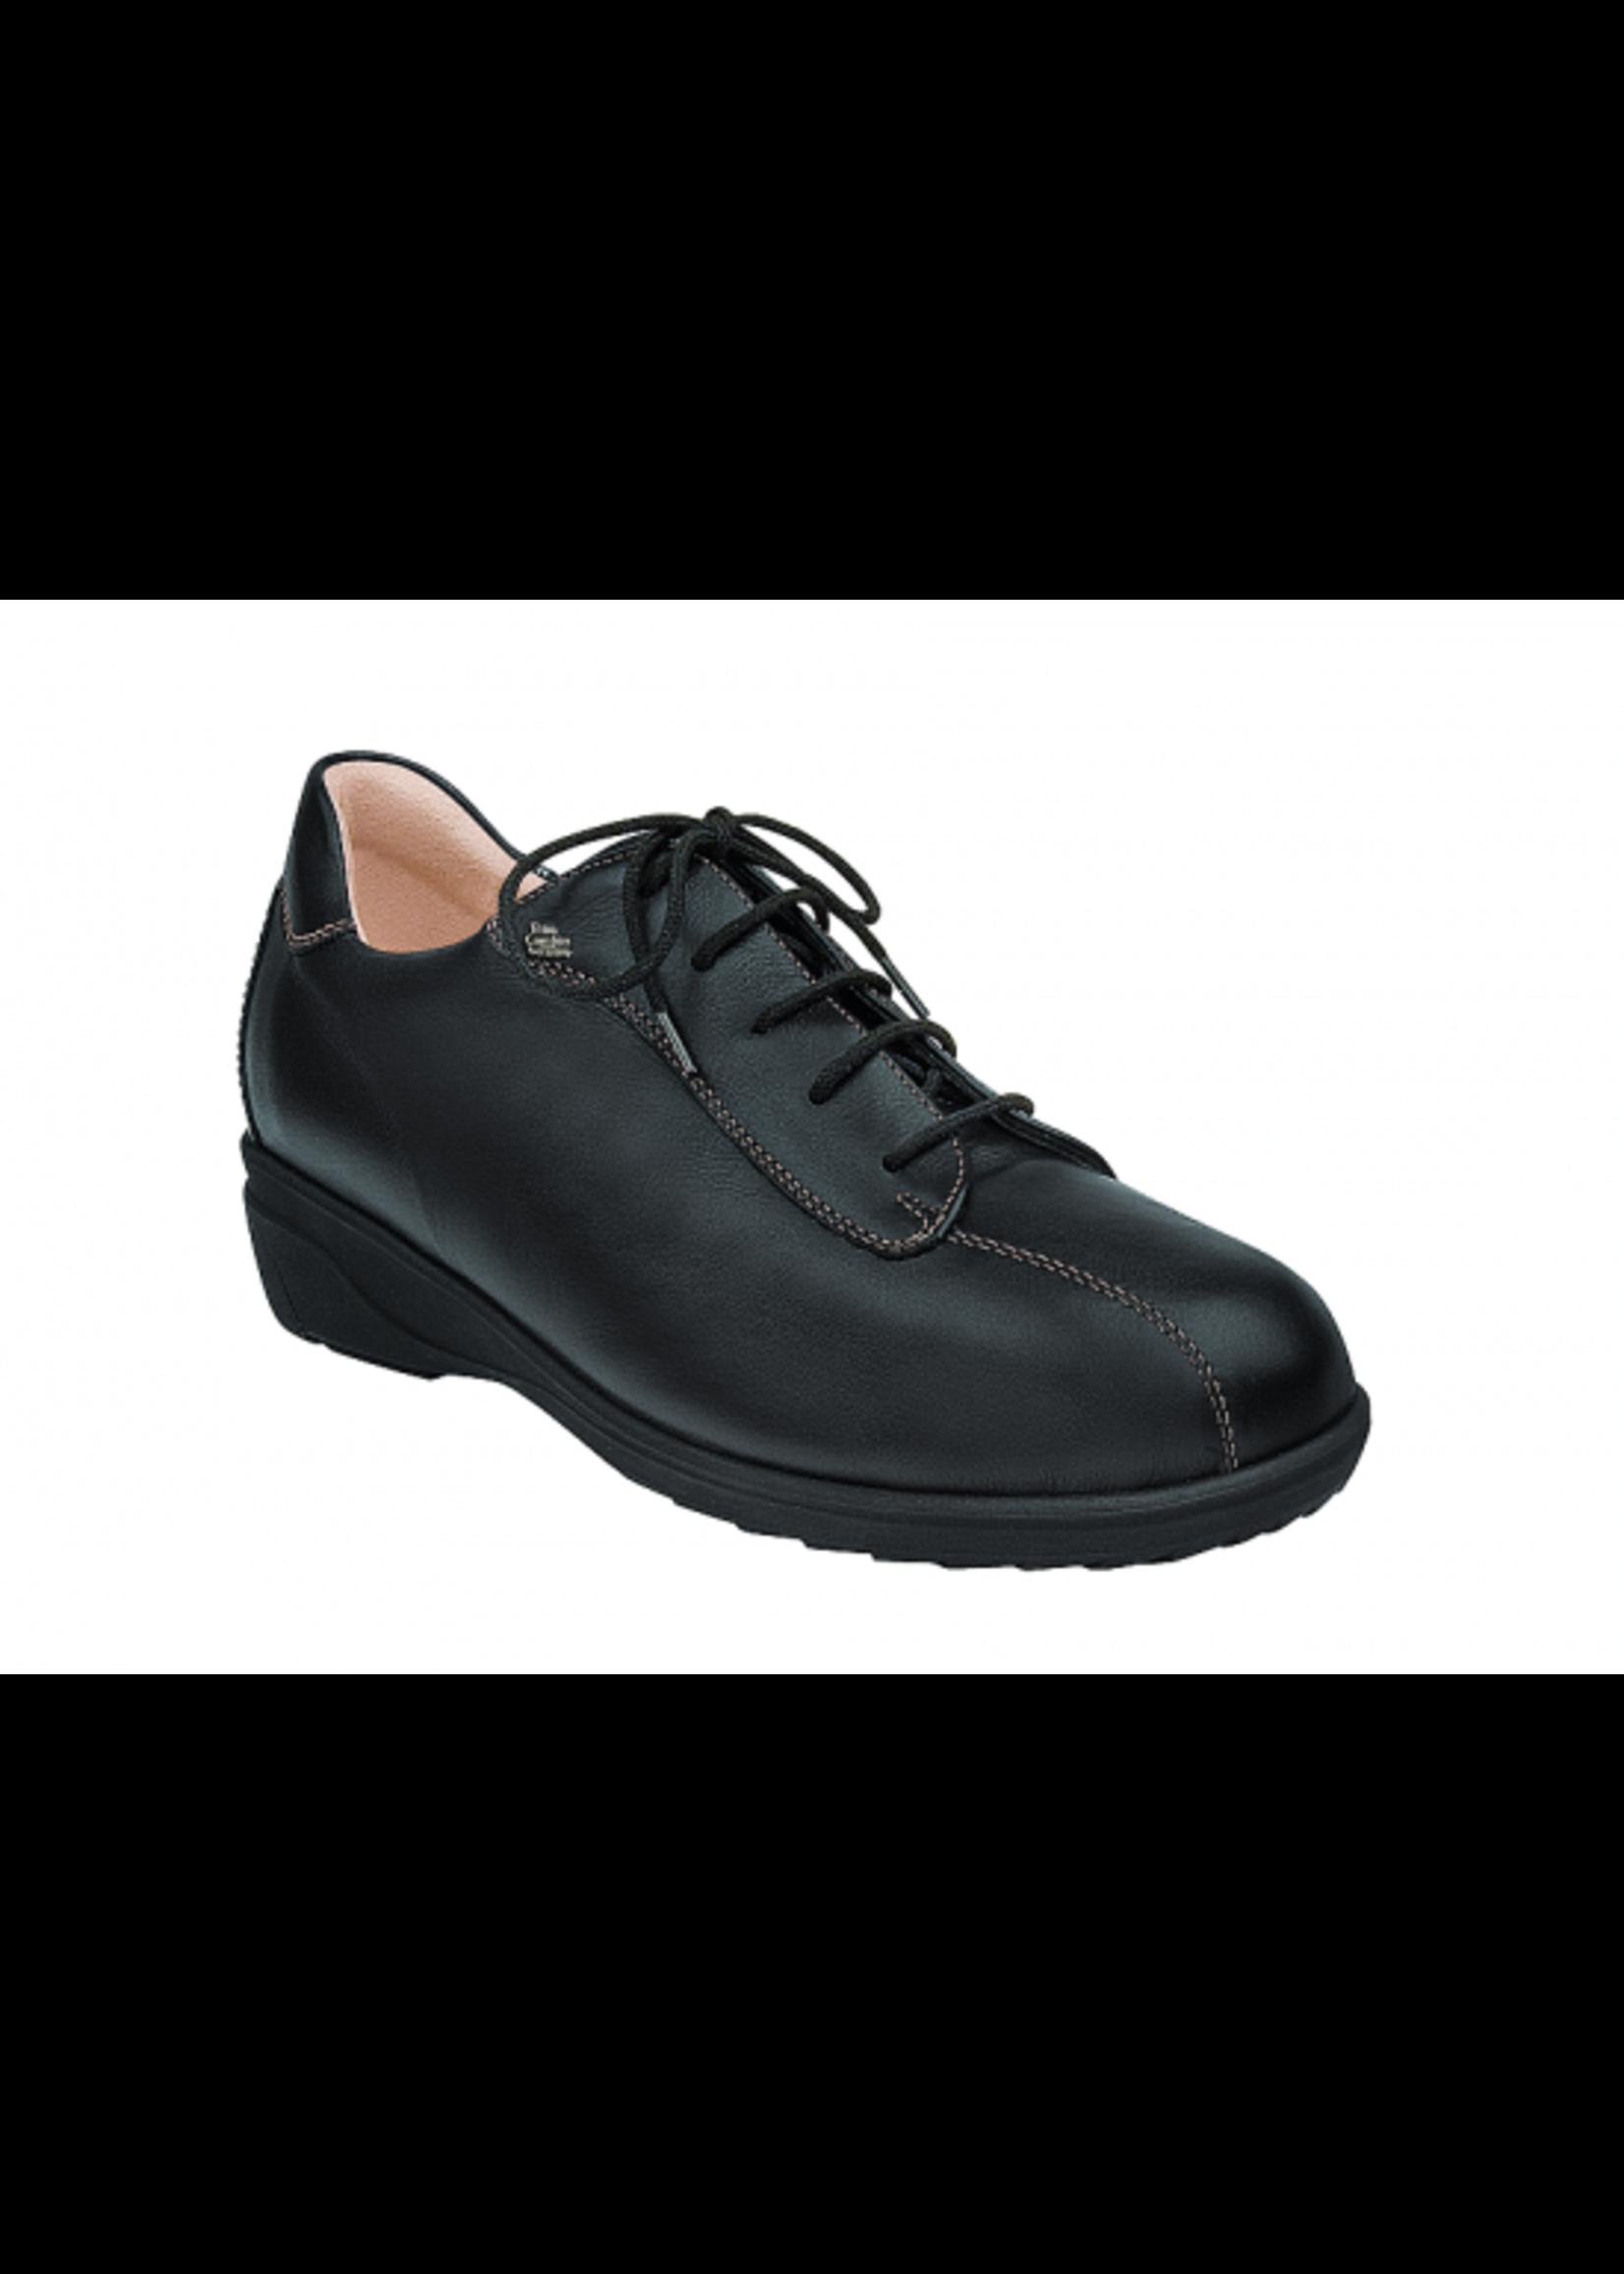 FINN COMFORT FINN COMFORT- 96514- BLACK